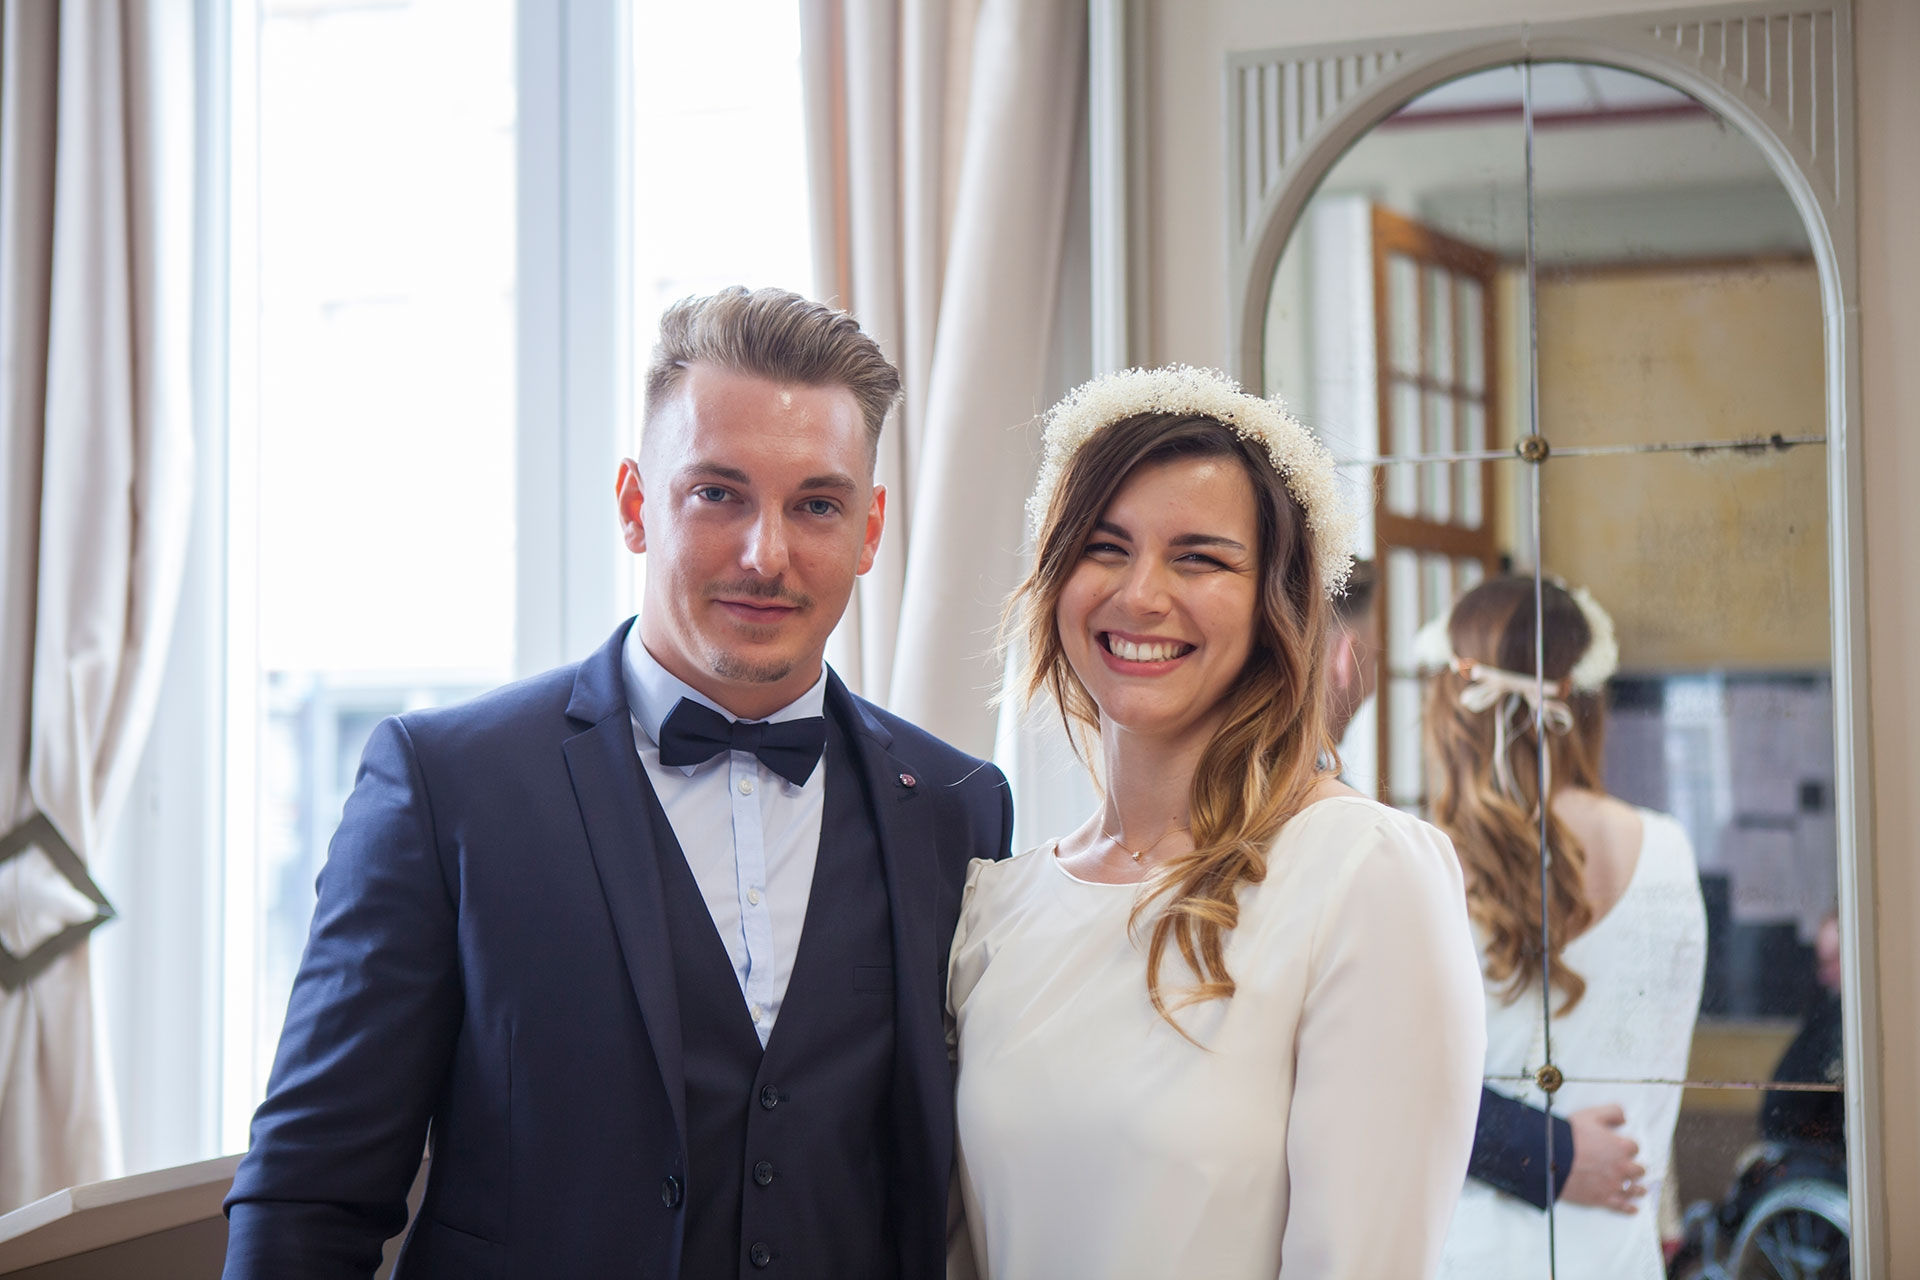 particuliers-evenements-mariages-oui-zelie&valentin-11